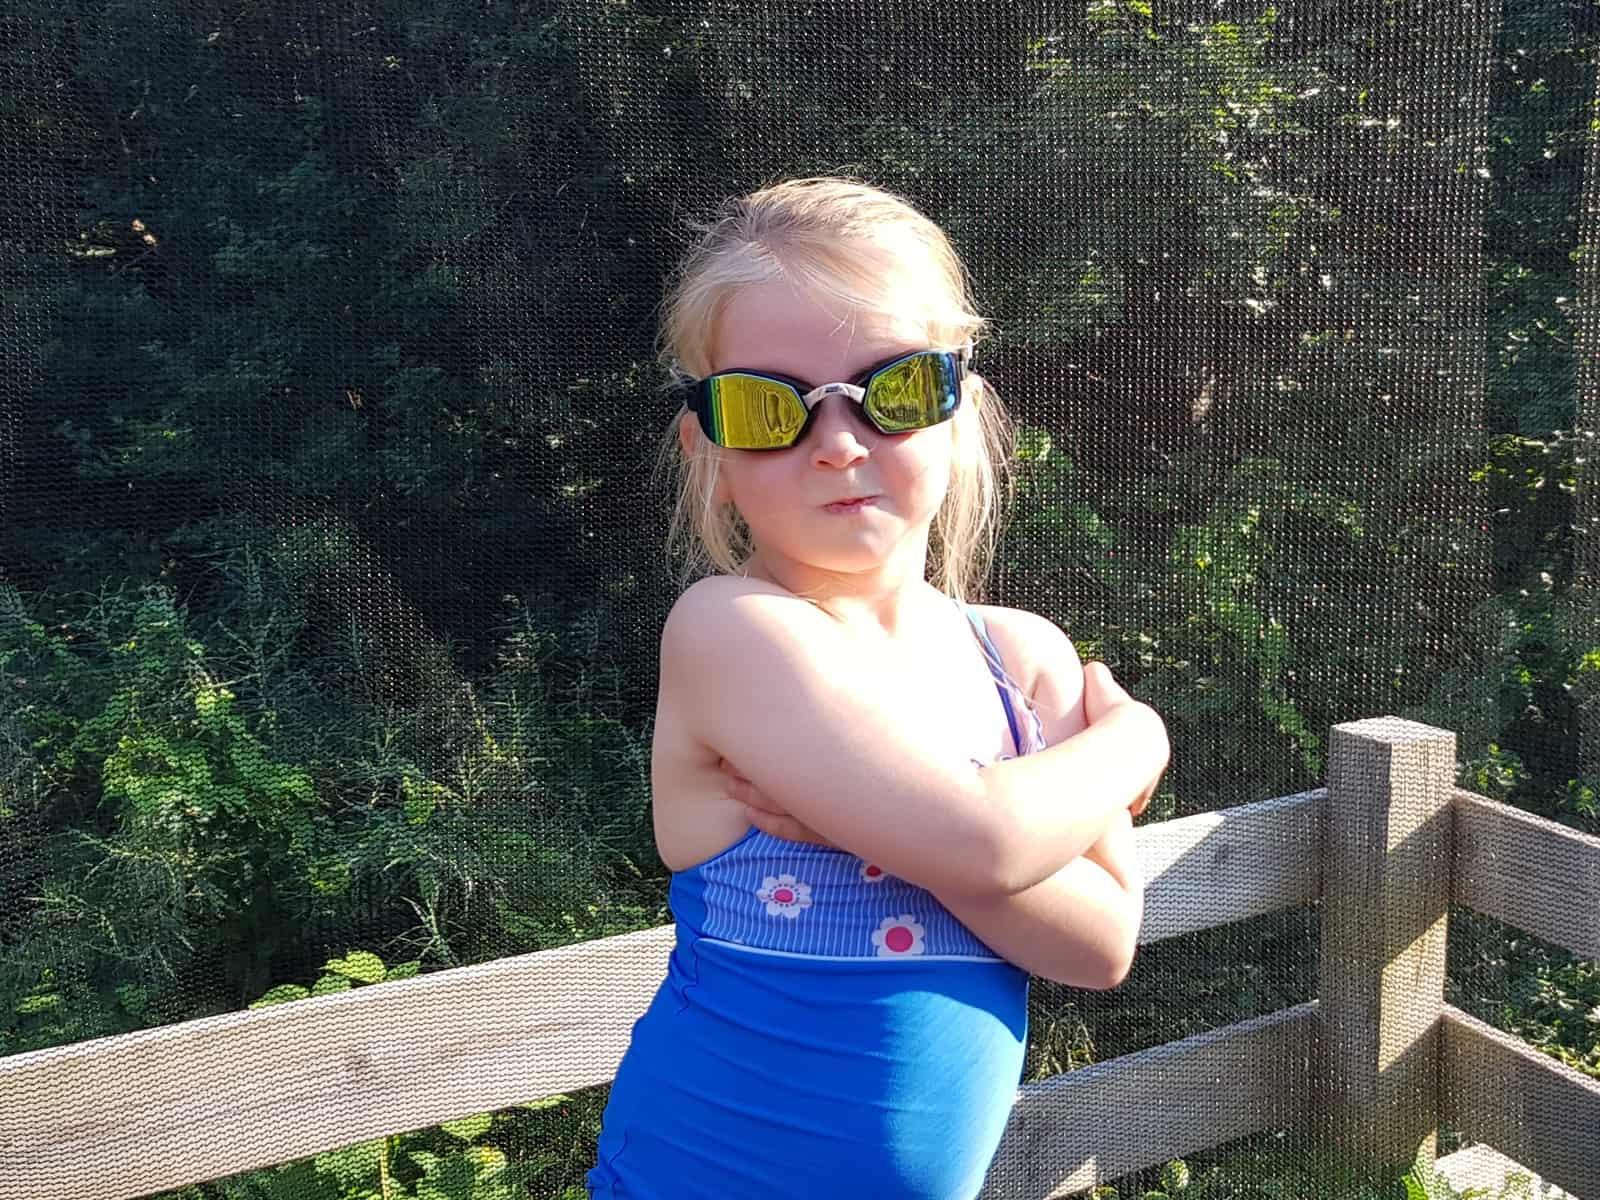 Aspire swimming challenge zoggs swimming costume and goggles